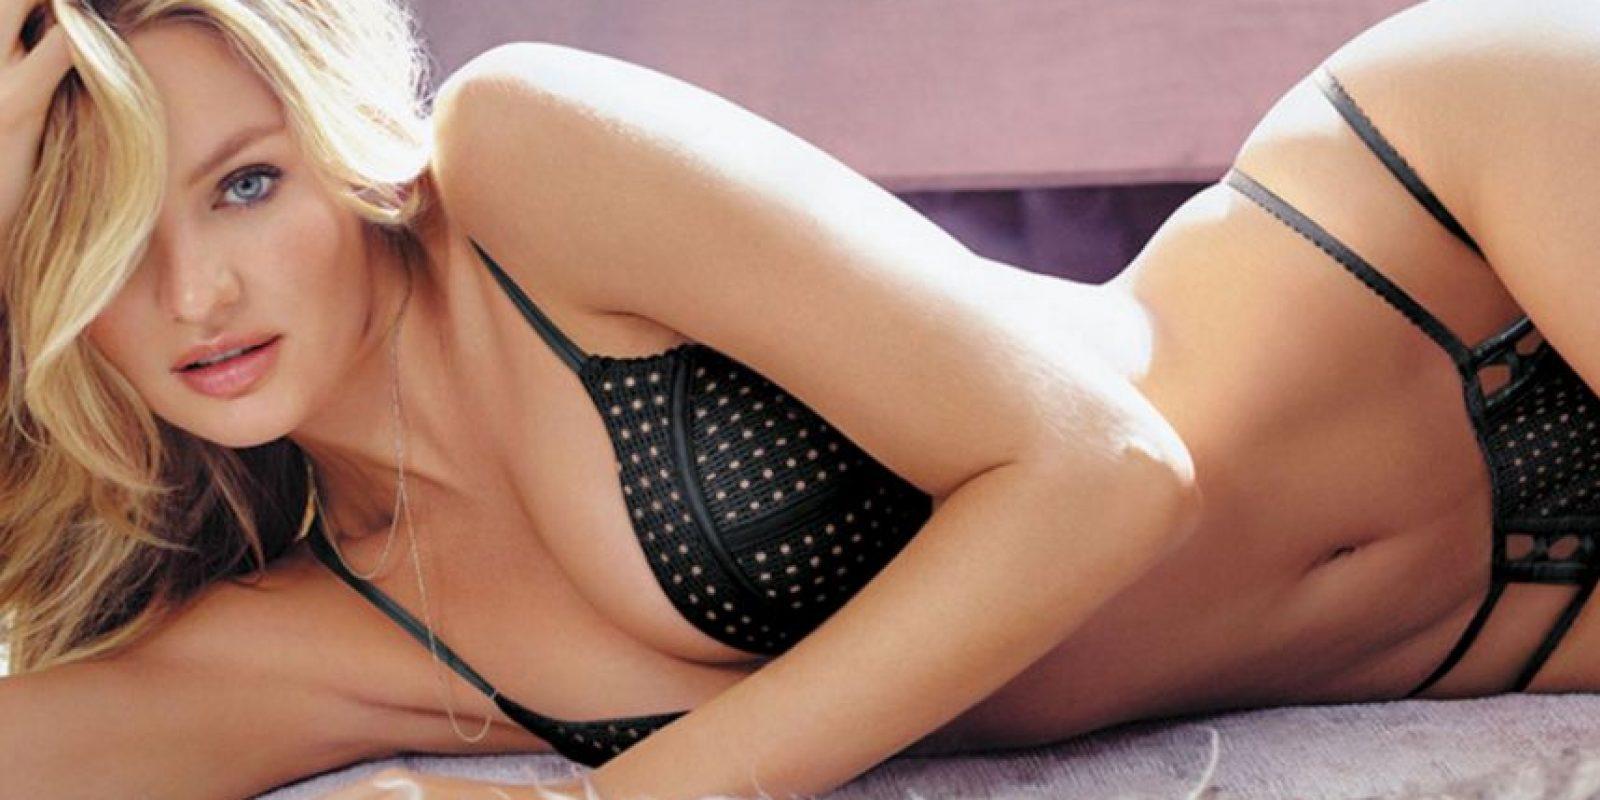 Candice Swanepoel Foto:Victoria's Secret